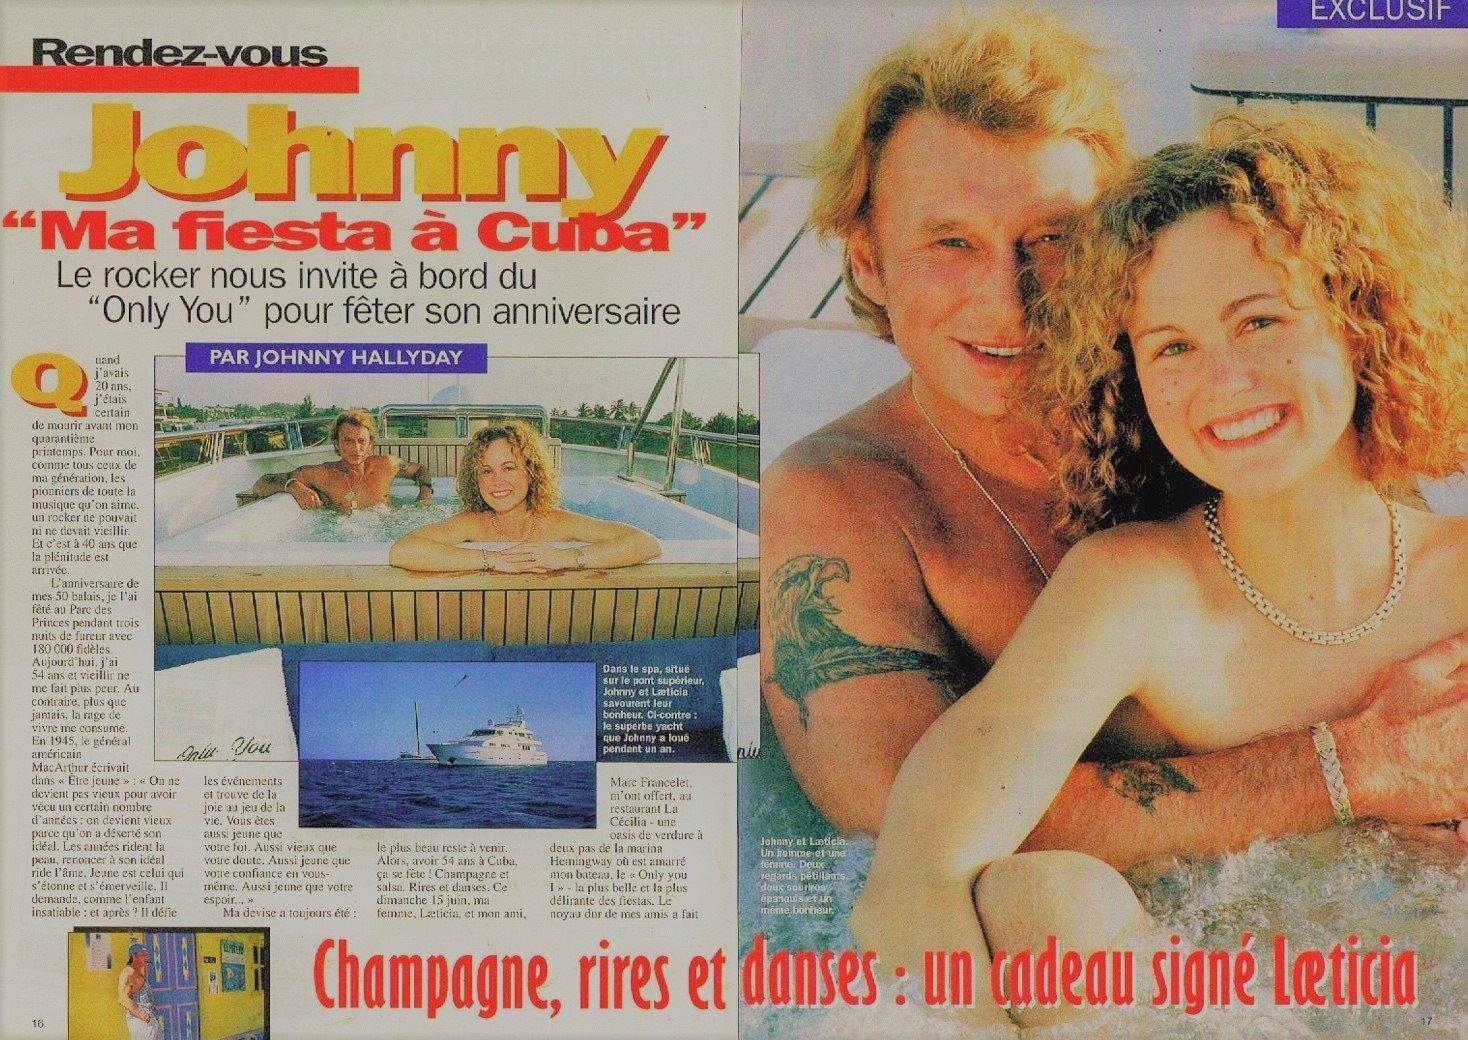 LES BATEAUX DE JOHNNY HALLYDAY 'ONLY YOU I' ( 1996 ) - Page 2 210322101827548572